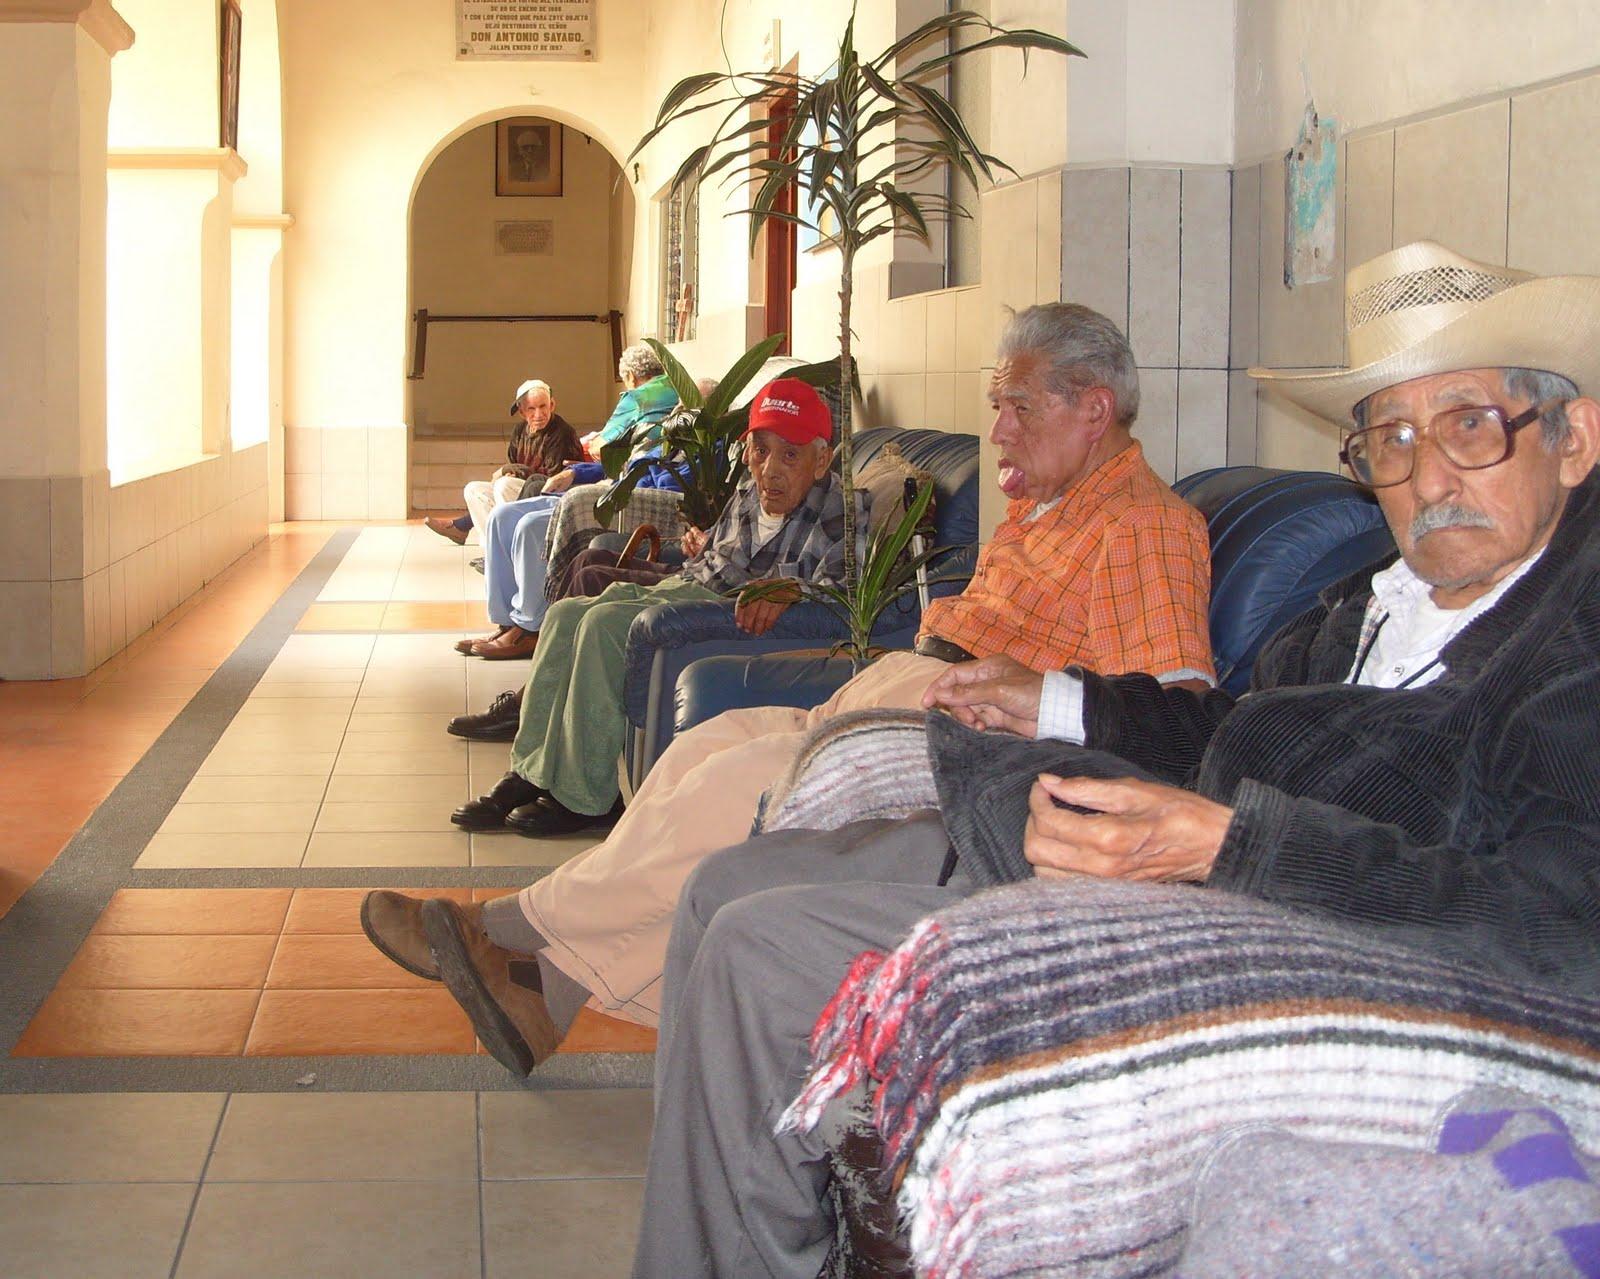 Concilio concilio 28 de agosto de 2011 for Asilos para ancianos